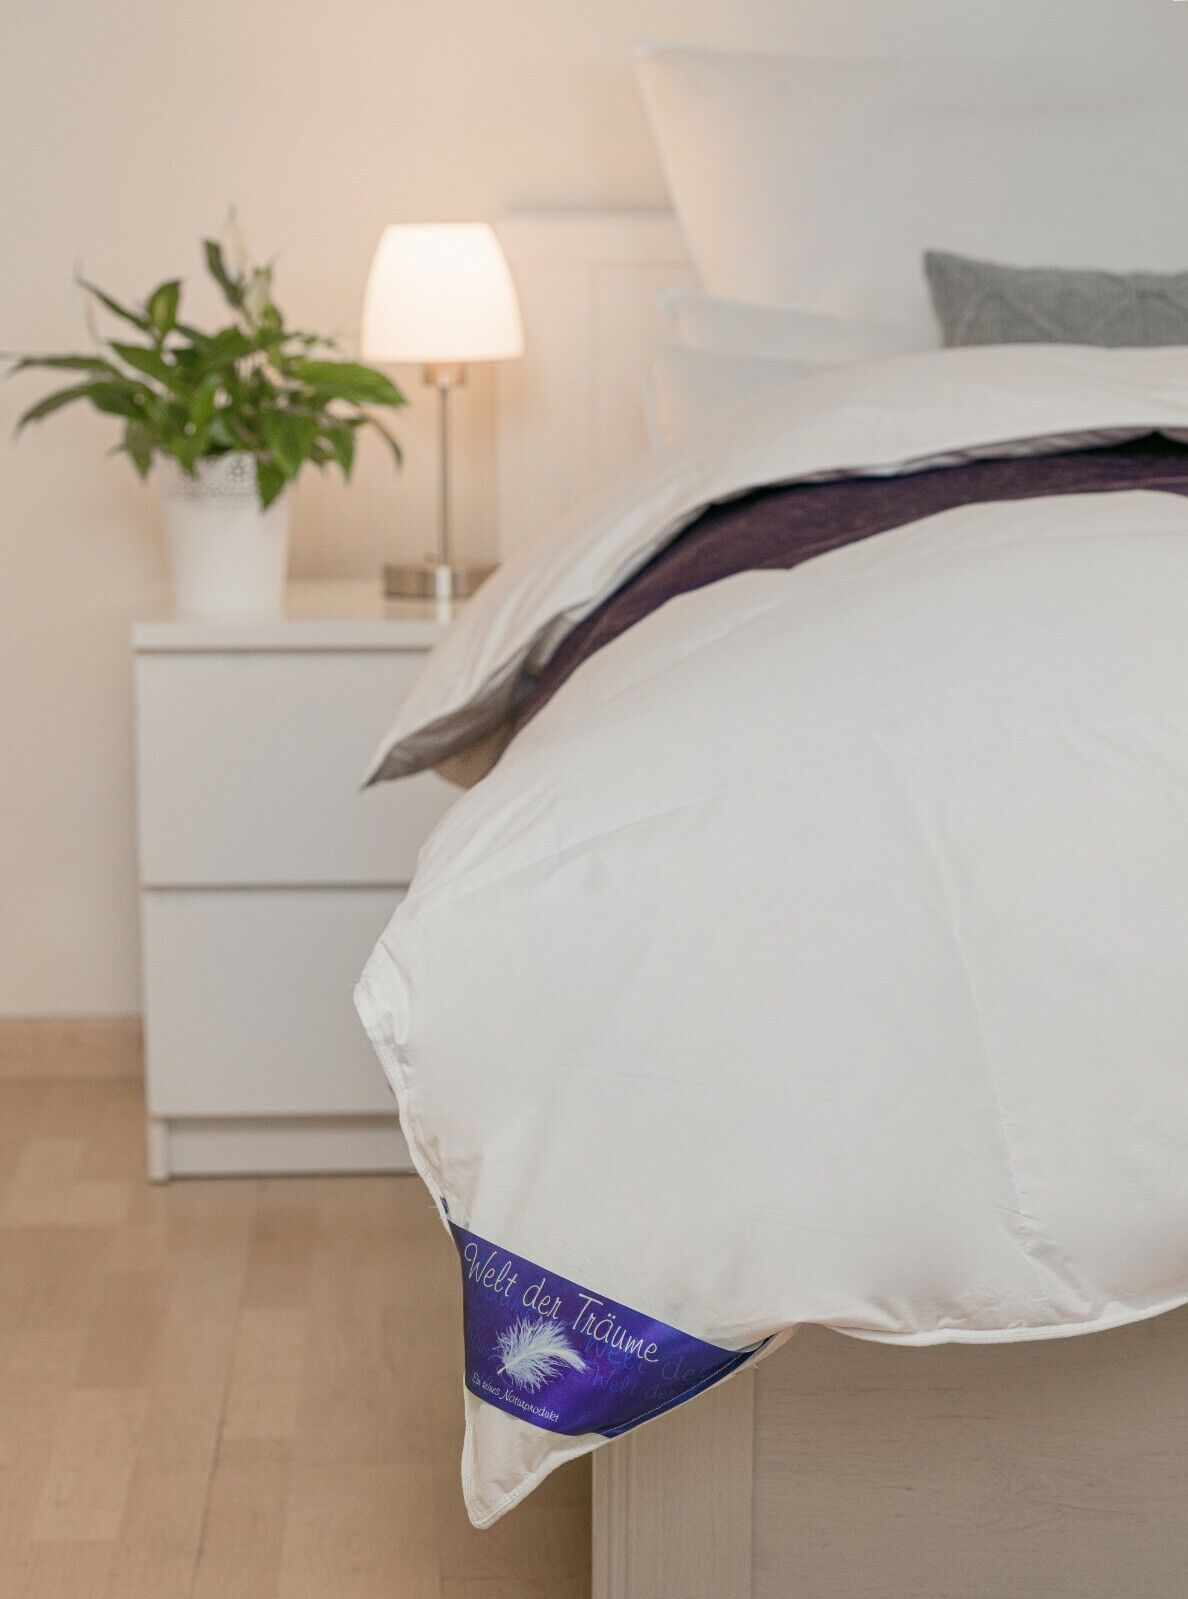 LUXUS Hotelqualität Daunendecke Bettdecke 100%Natur Steppdecke Decke Daunen